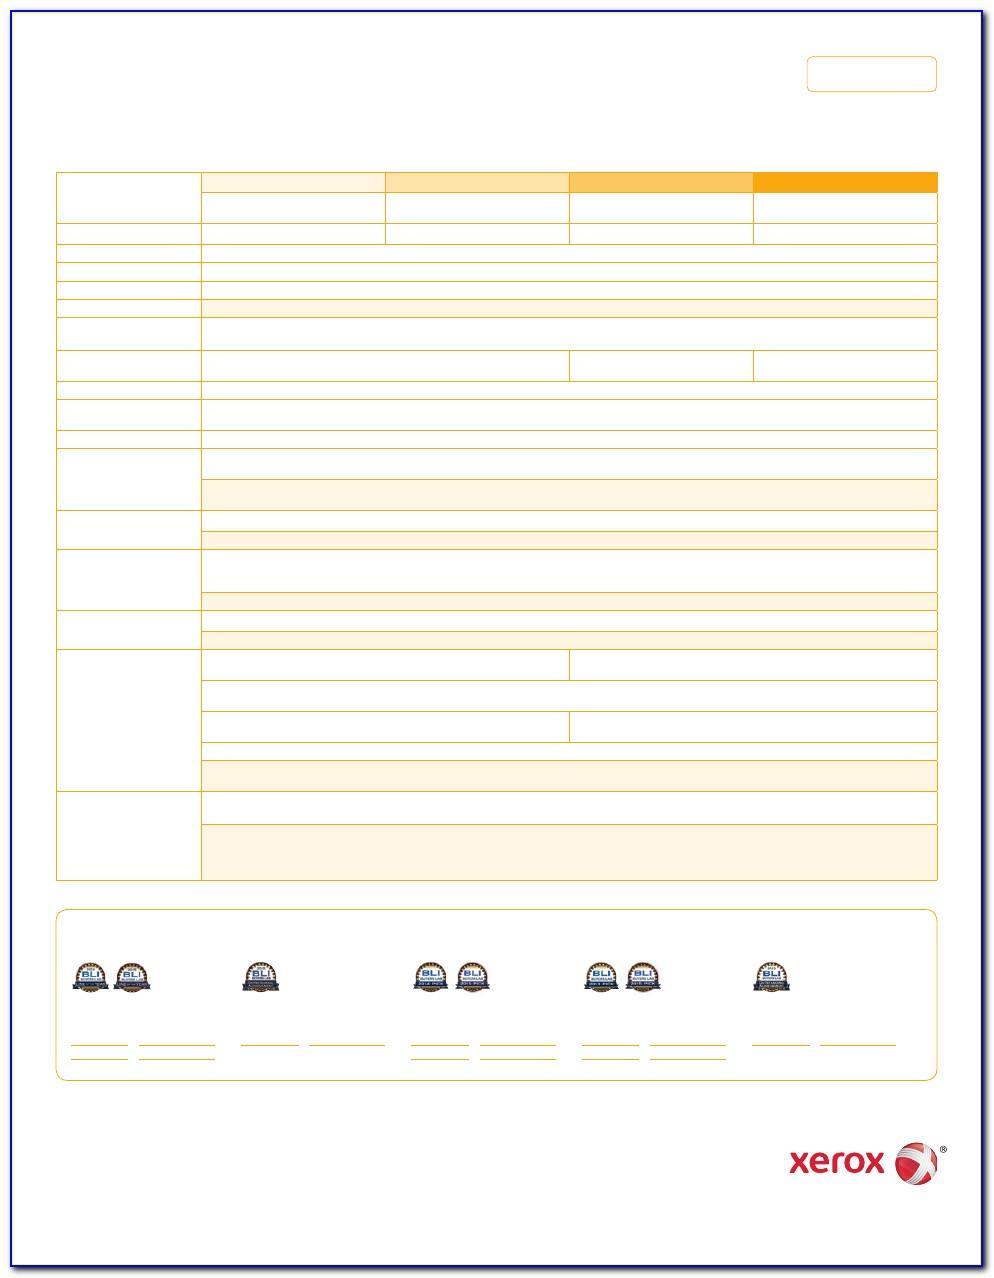 Xerox 7845 Detailed Brochure